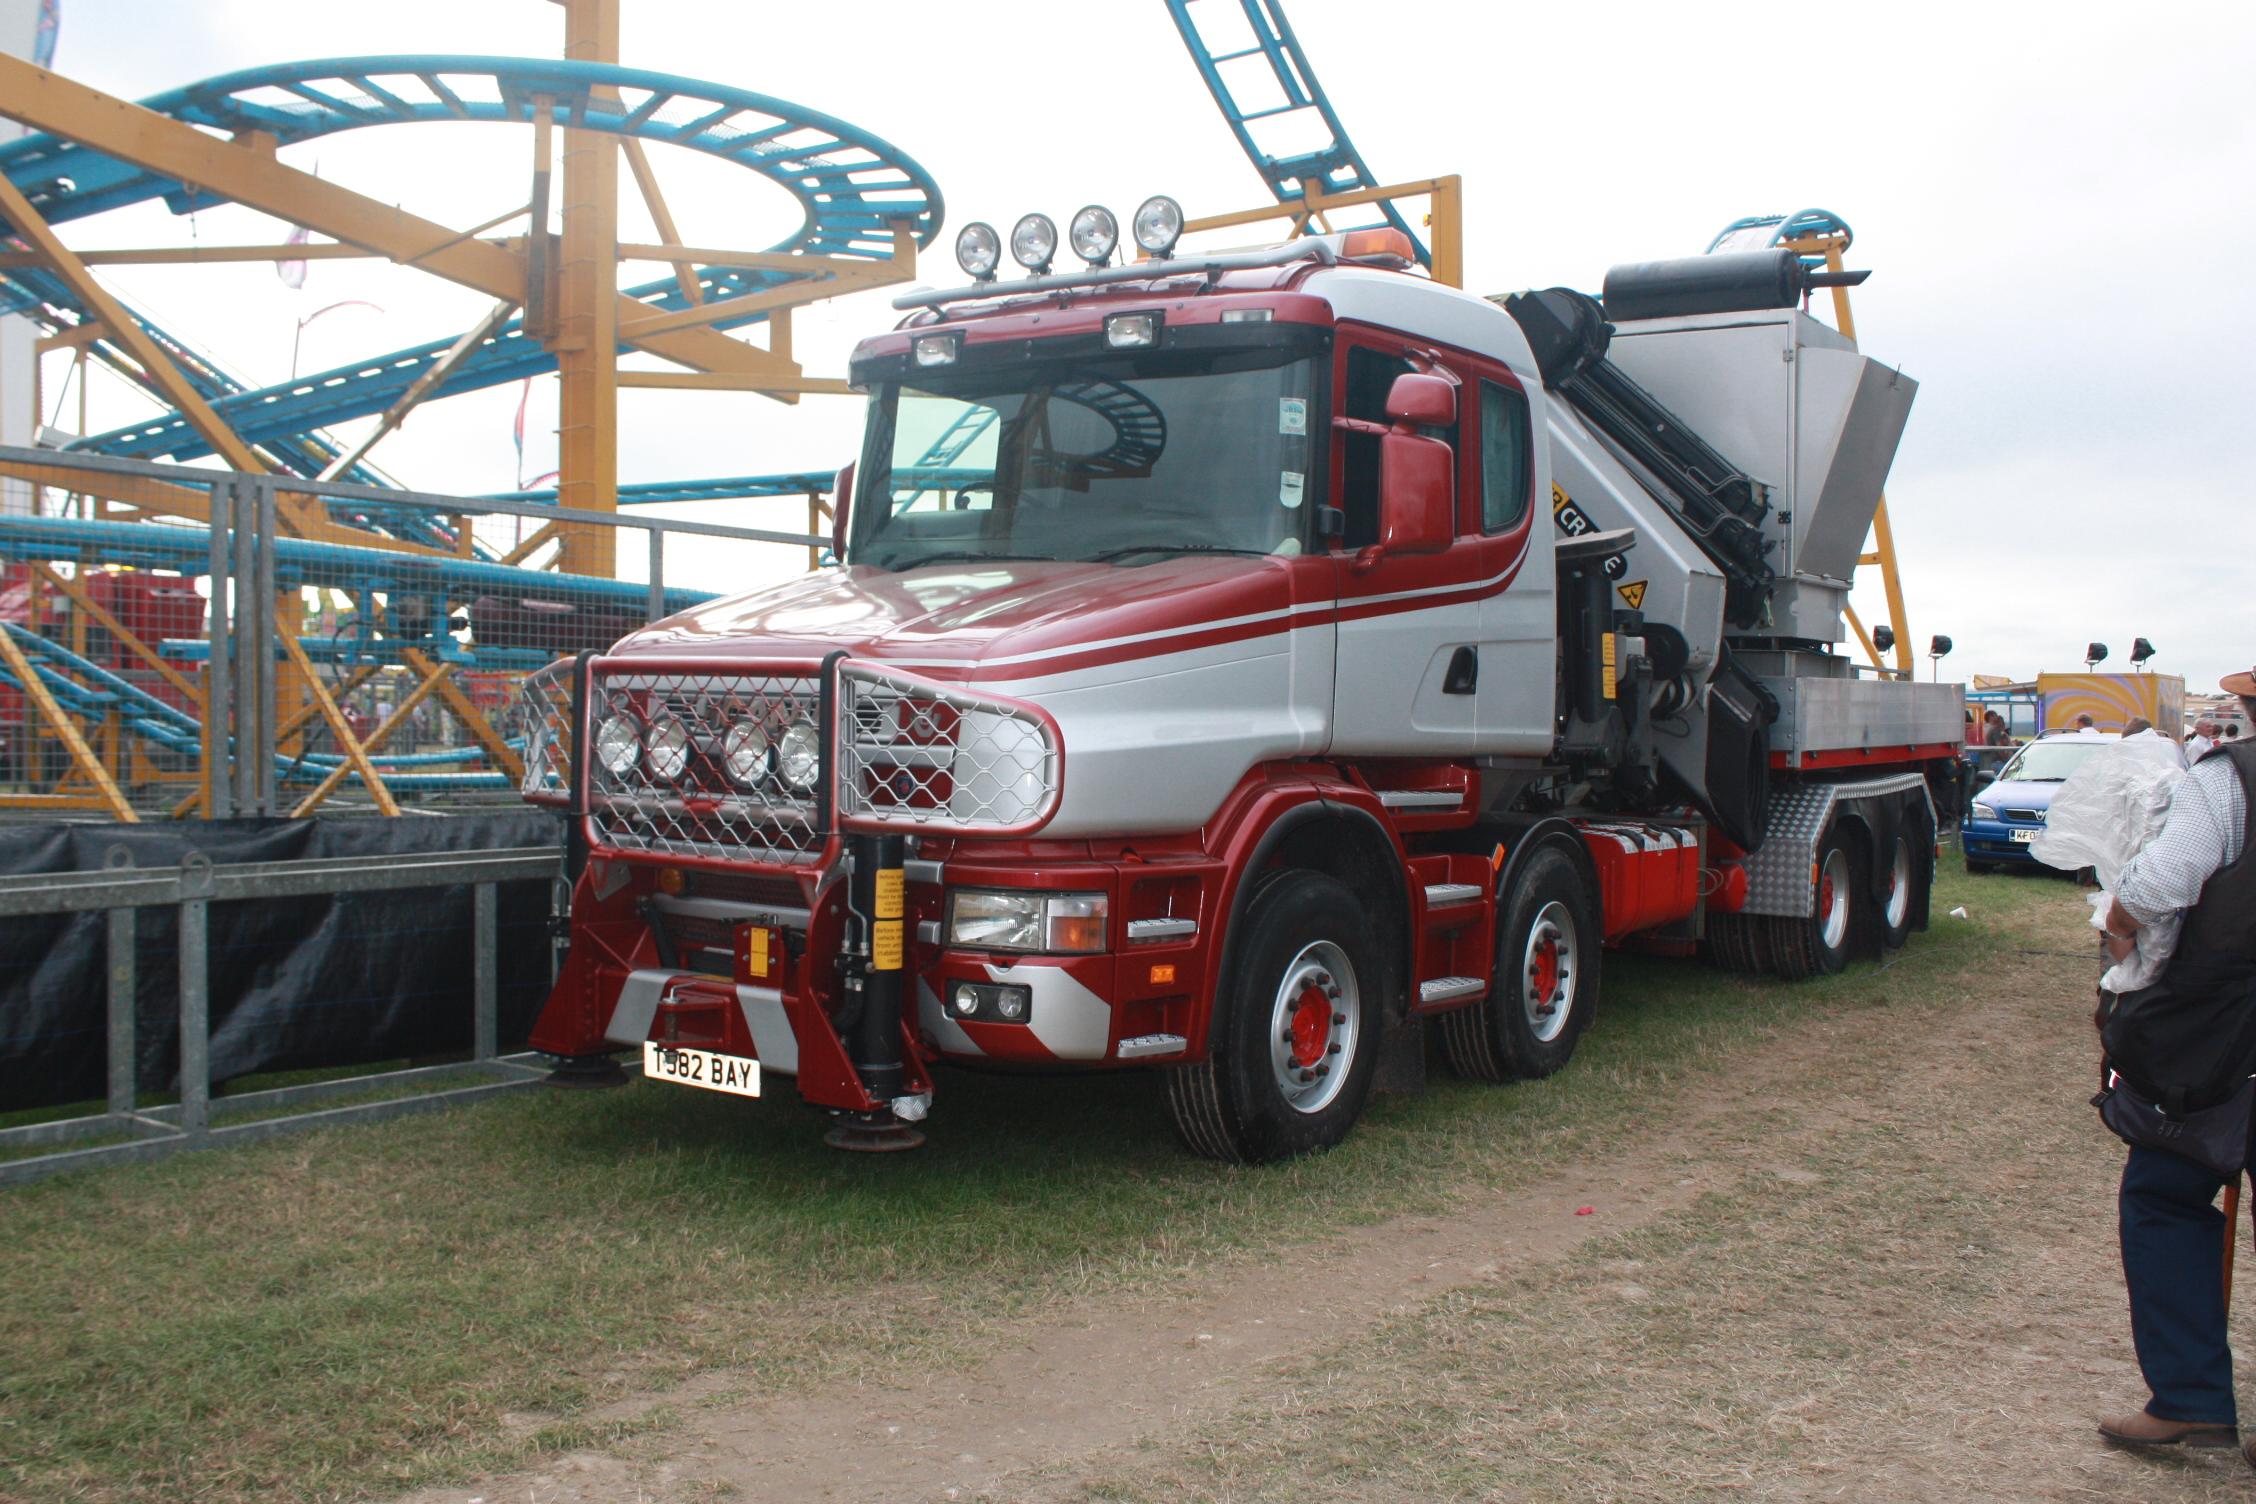 scania azienda Palfinger_crane_on_bonneted_Scania_8x4_at_GDSF_08_-_IMG_1033